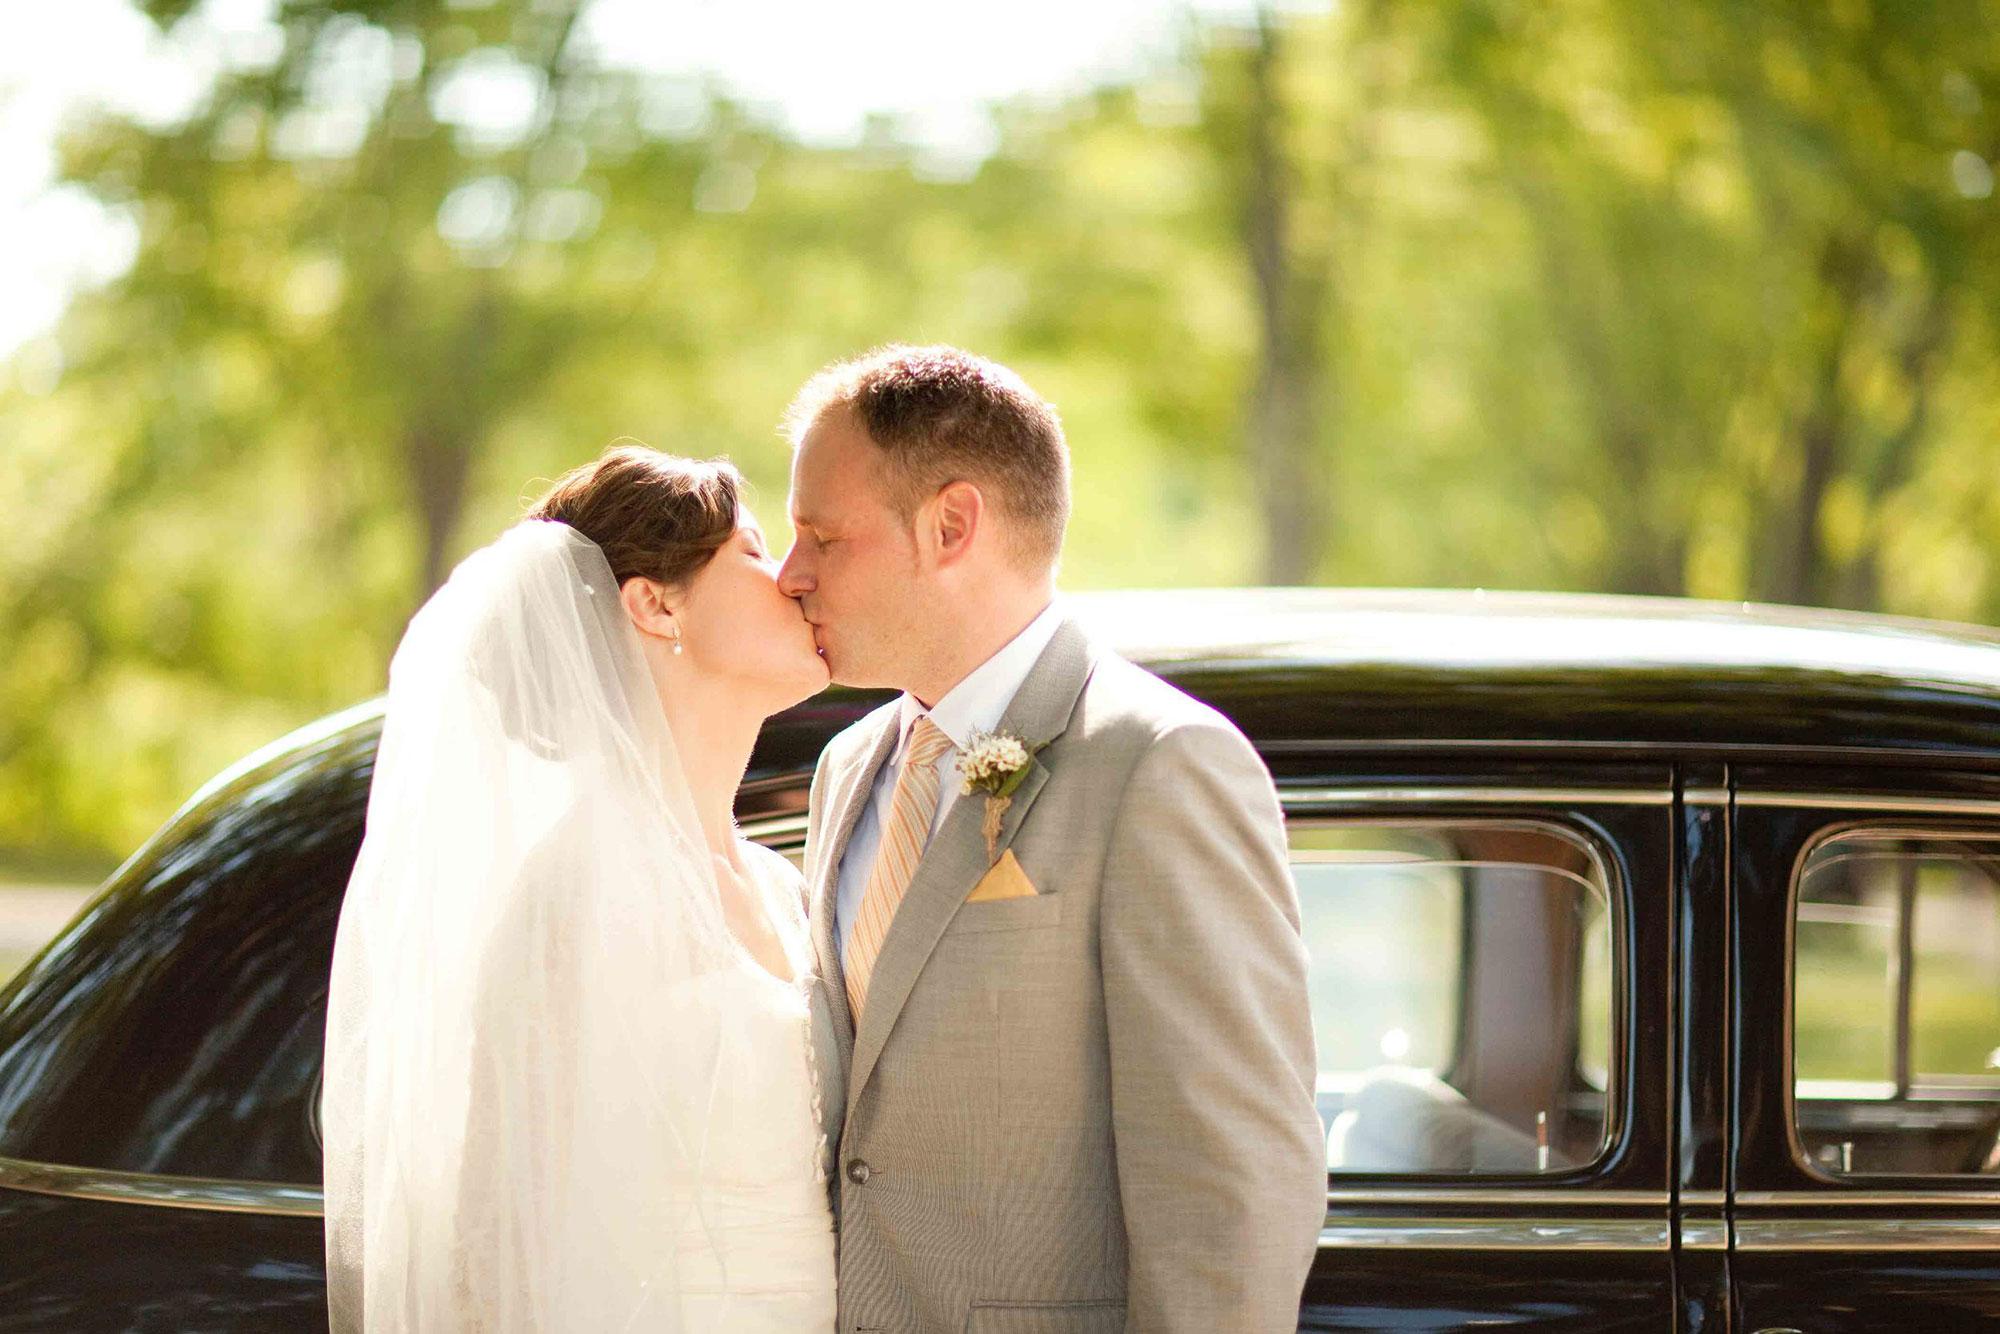 Amanda-Cowley-Willowbank-Vineyard-Bride-Photo-By-White-Photographie-012.jpg